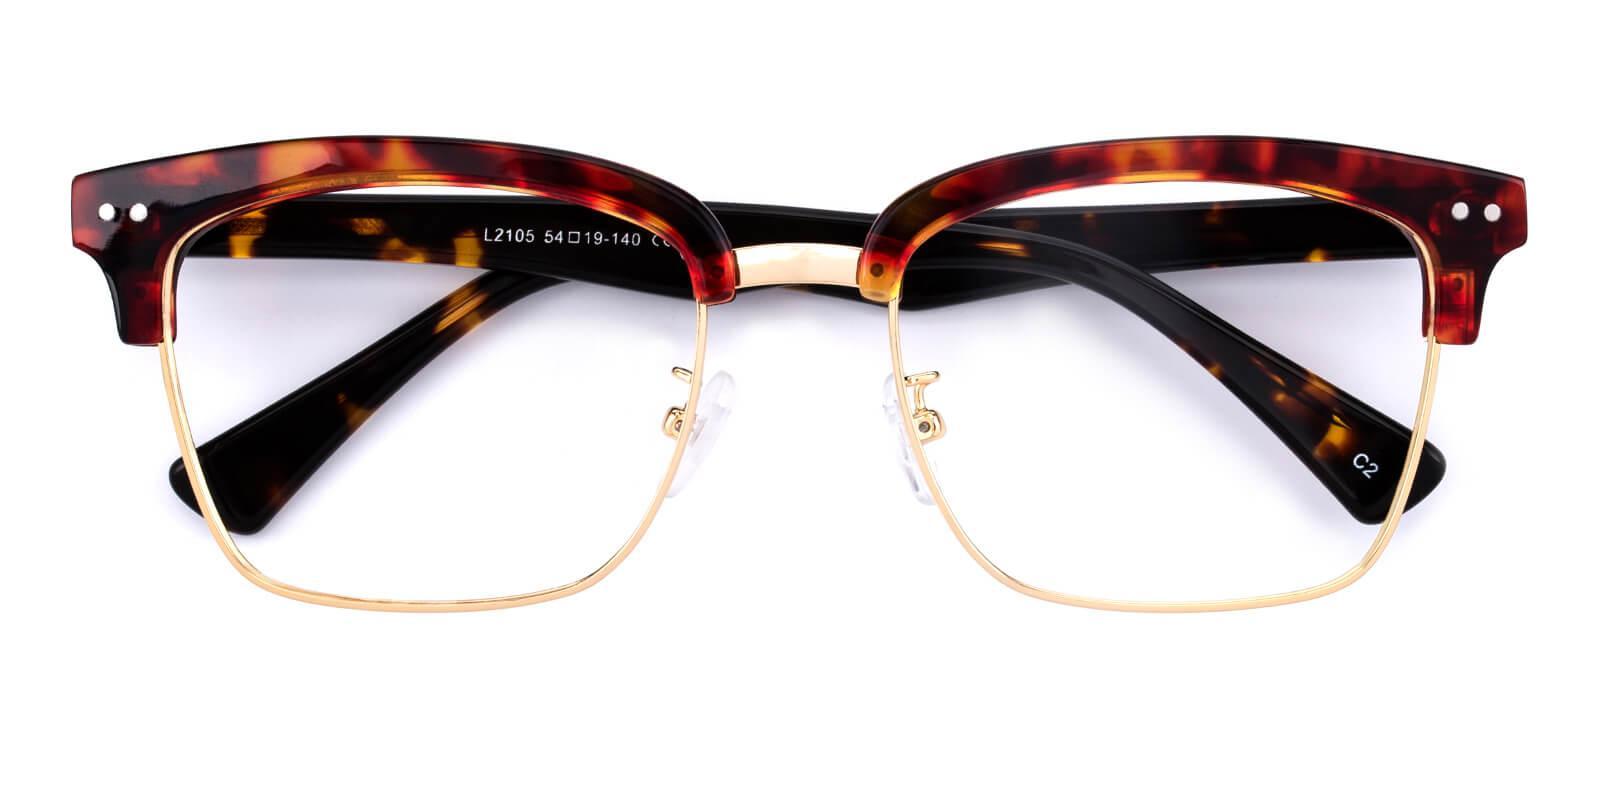 Ellimim-Tortoise-Browline-Acetate / Metal-Eyeglasses-detail